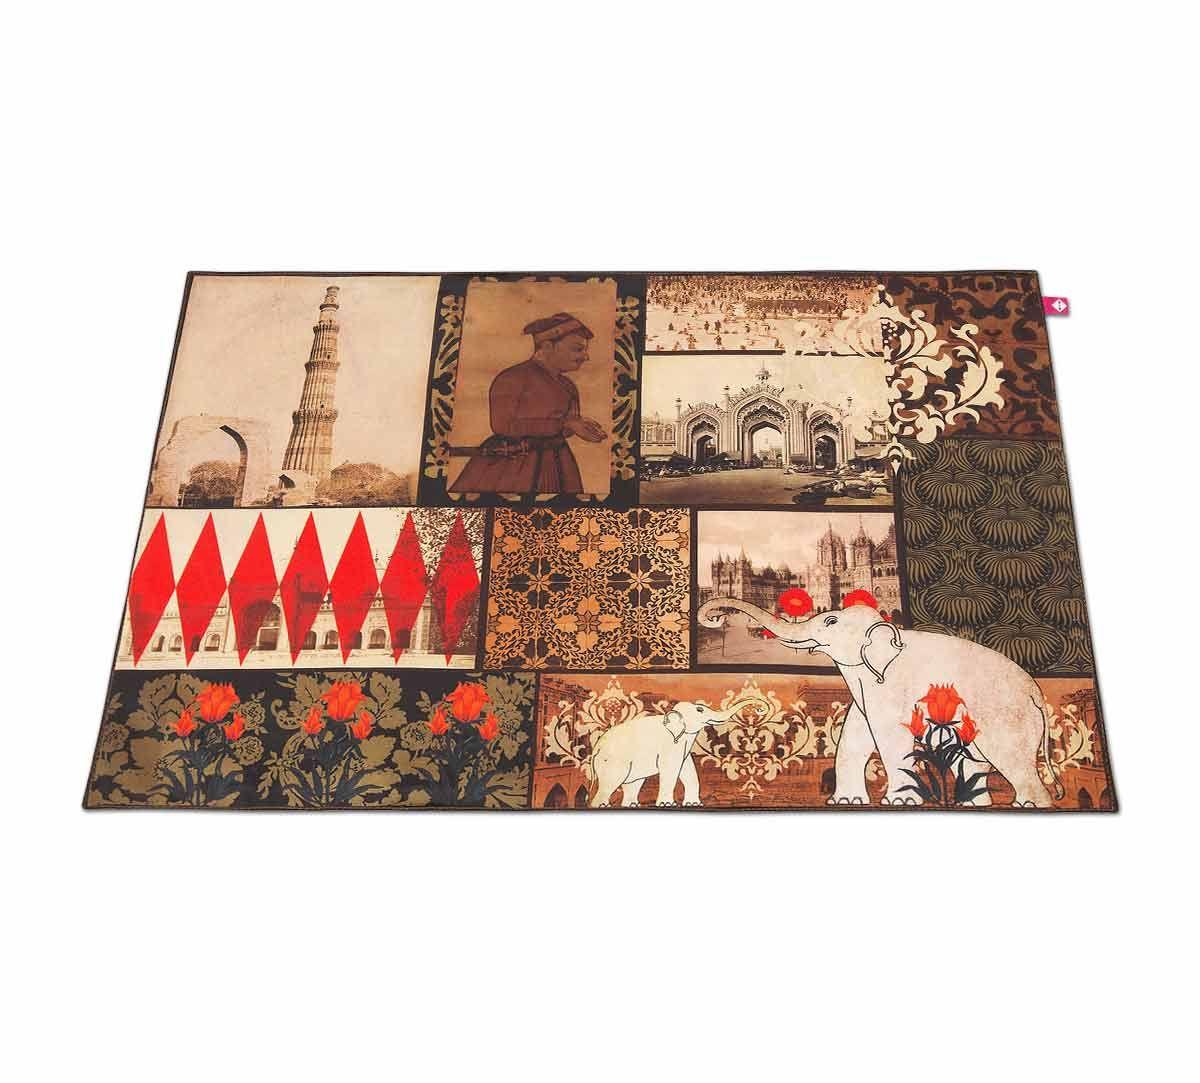 India Circus The Mughal Era Table Mats Set of 6